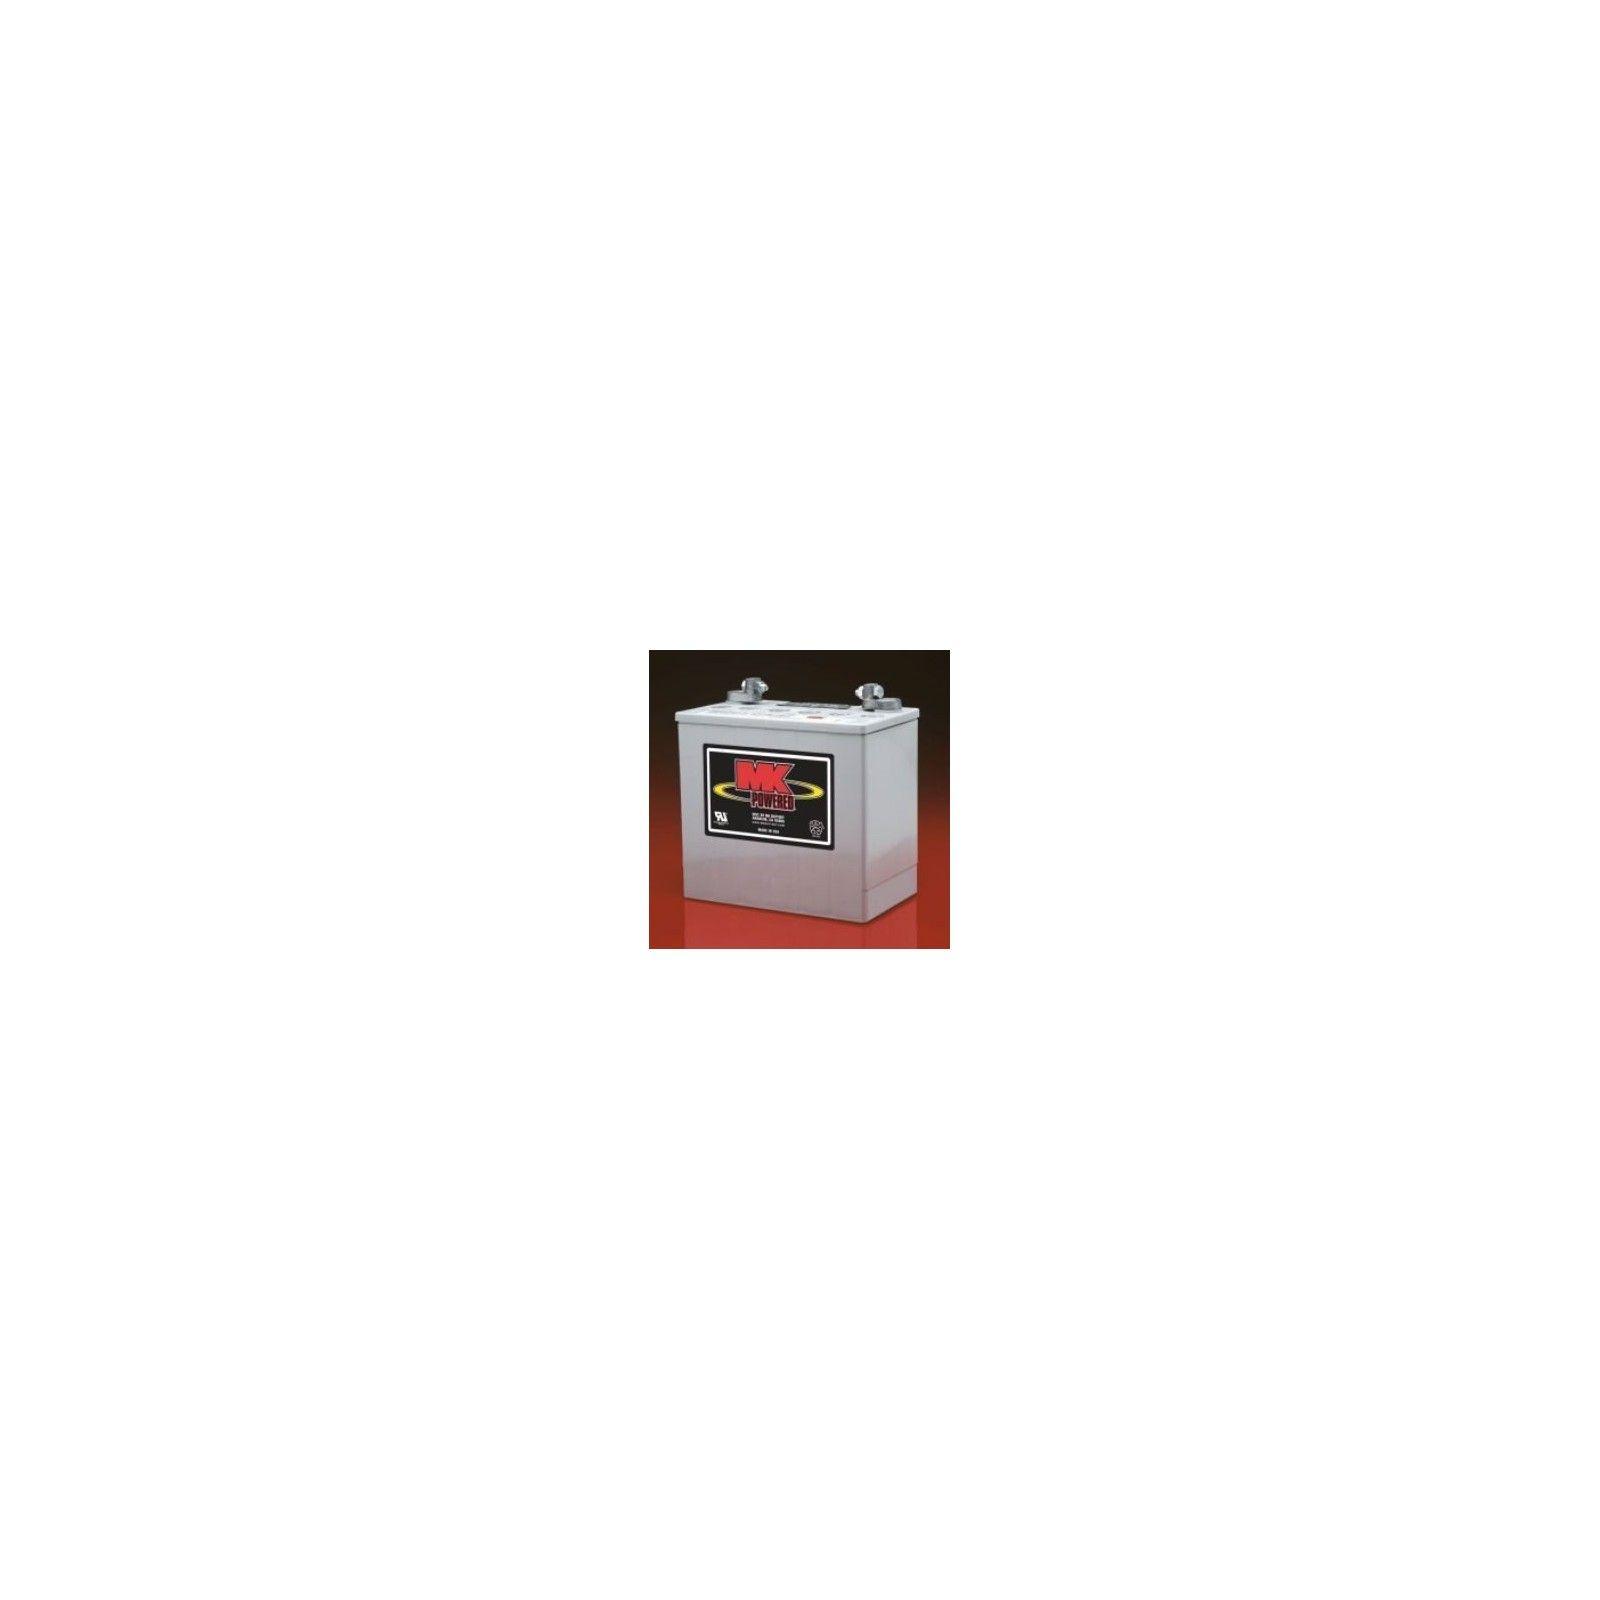 Batería MK 8G22NF 51Ah 12V Gel MK - 1